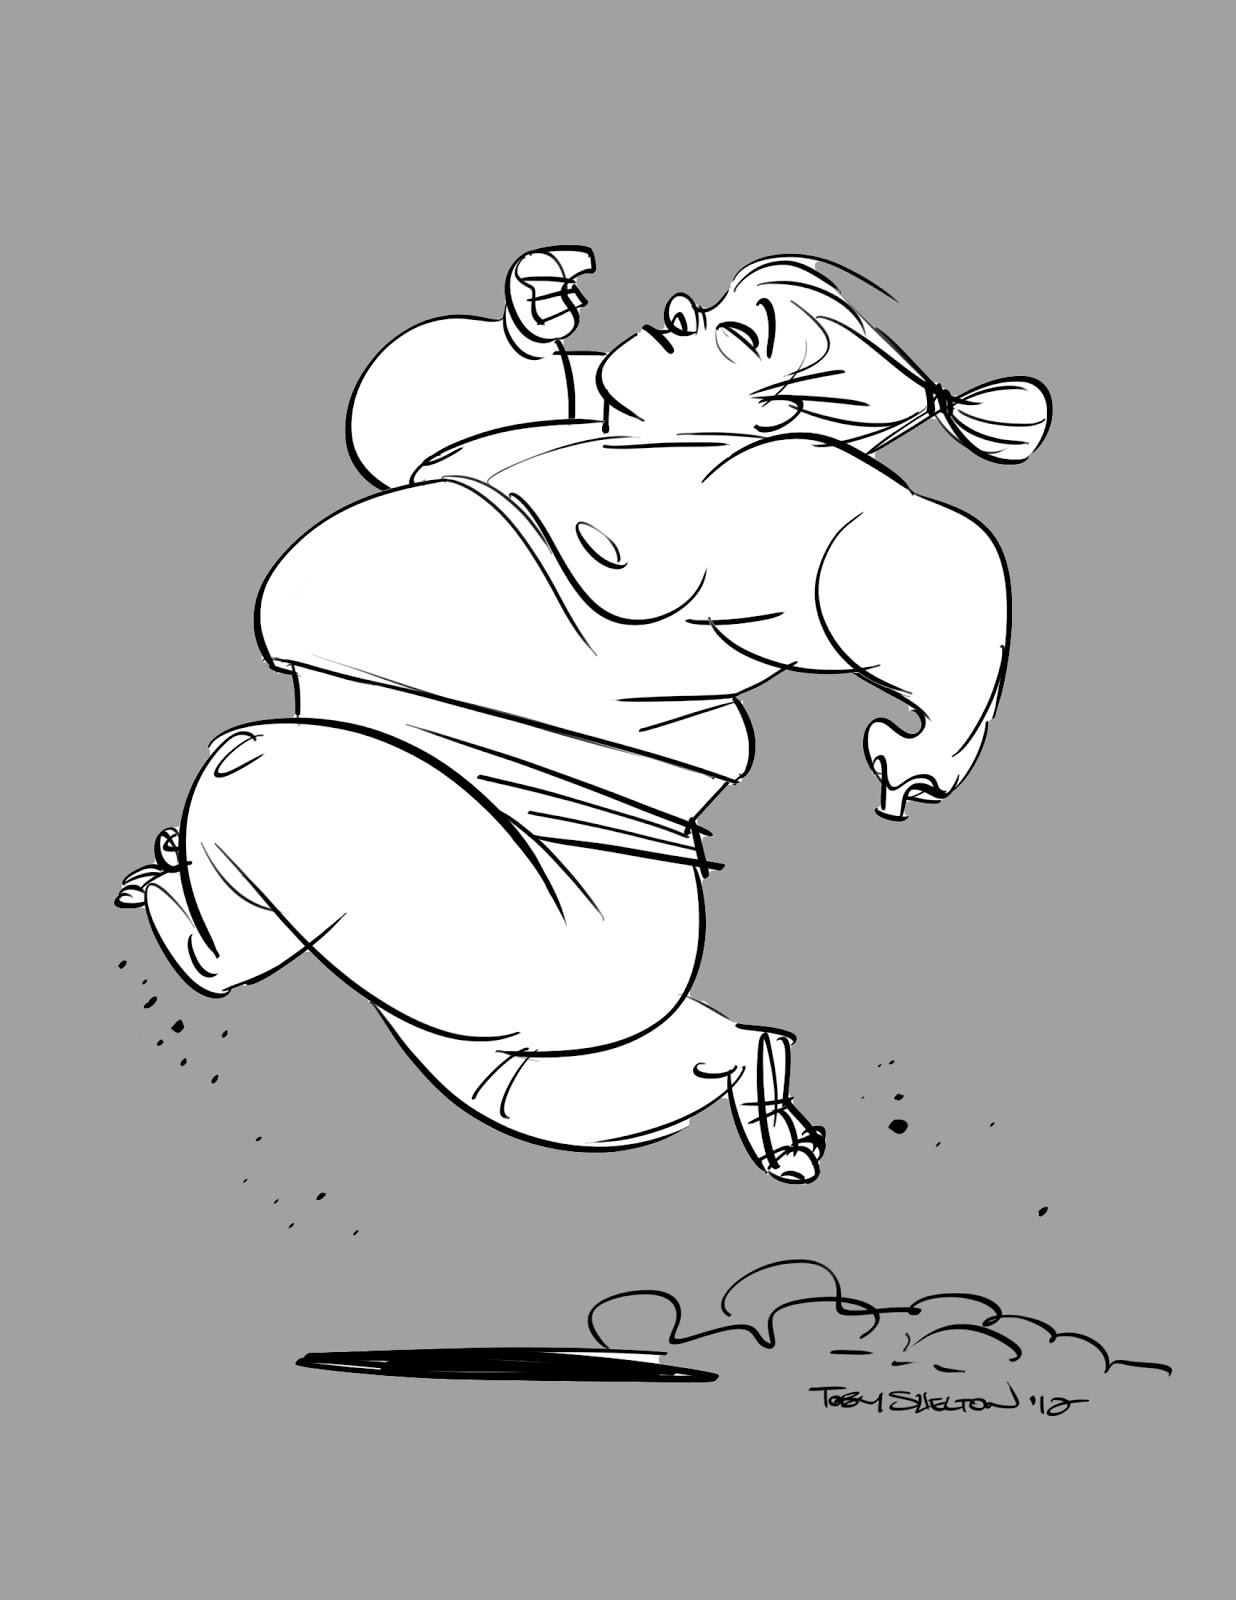 1236x1600 The Animation Woodpile Sumo Wrestler (Walk, Run)